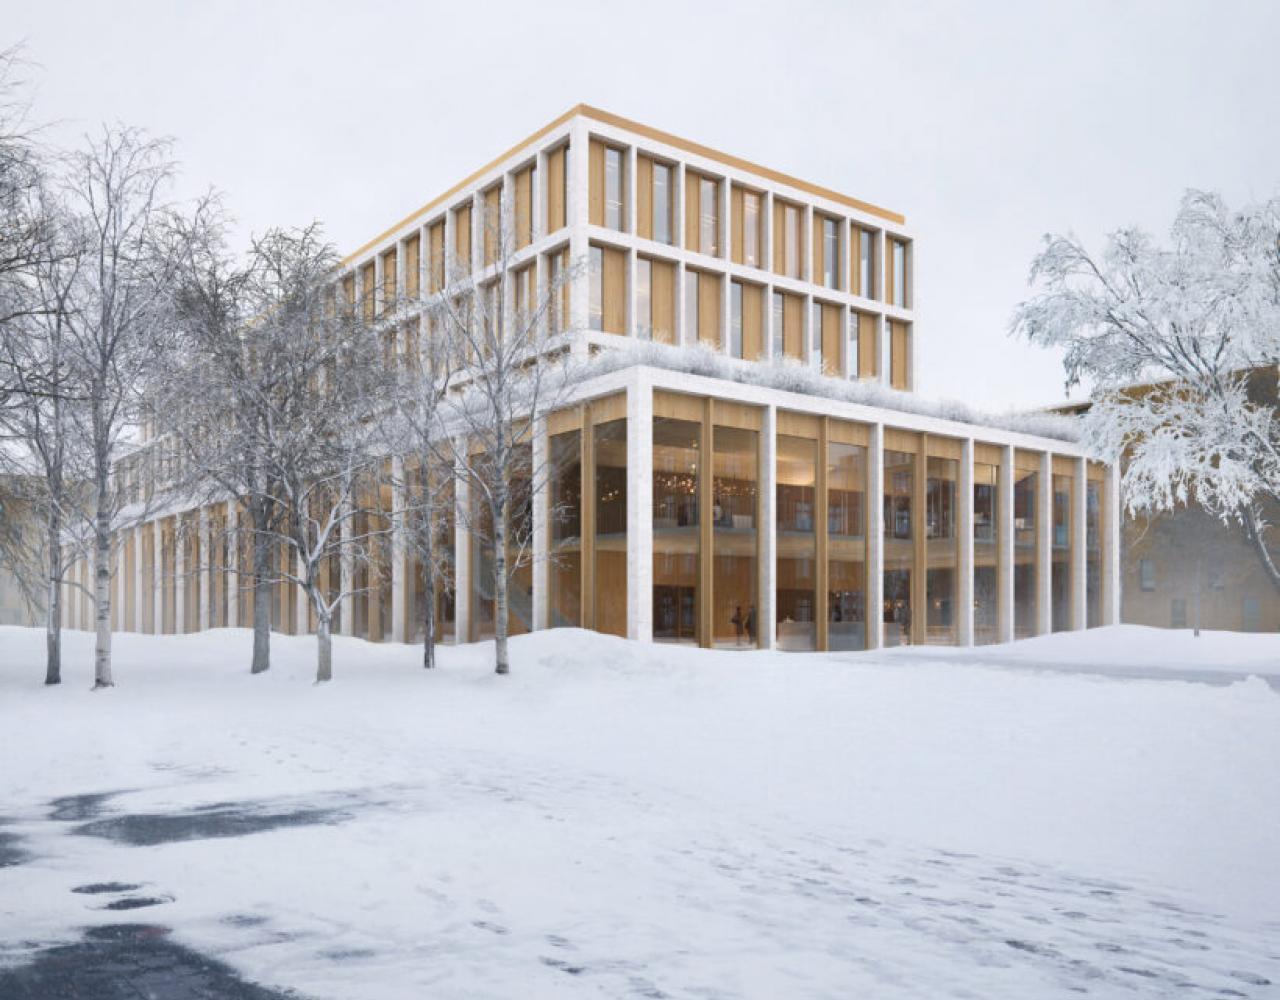 Rådhus, Werk, Rødovre